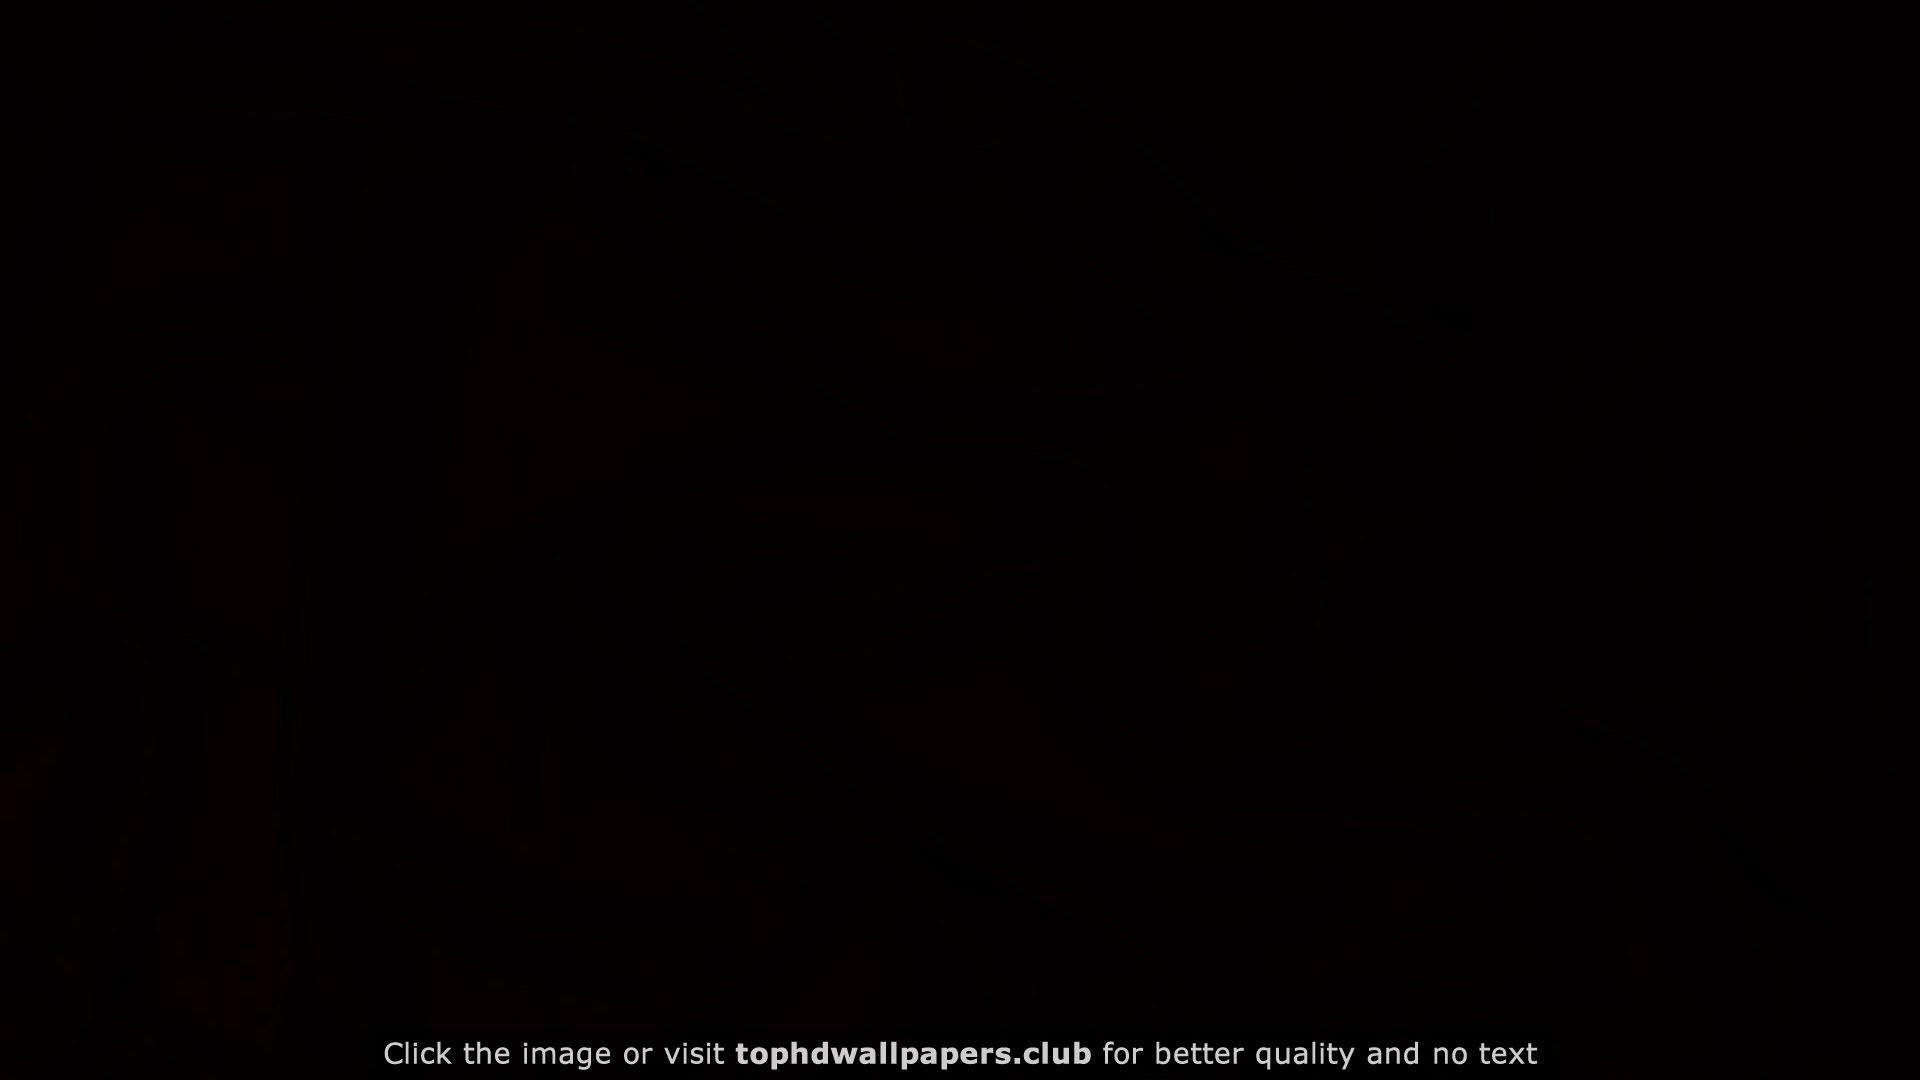 1920x1080 S Black Cool Windows Desktop Dark 4K Or HD Wallpaper For Your PC